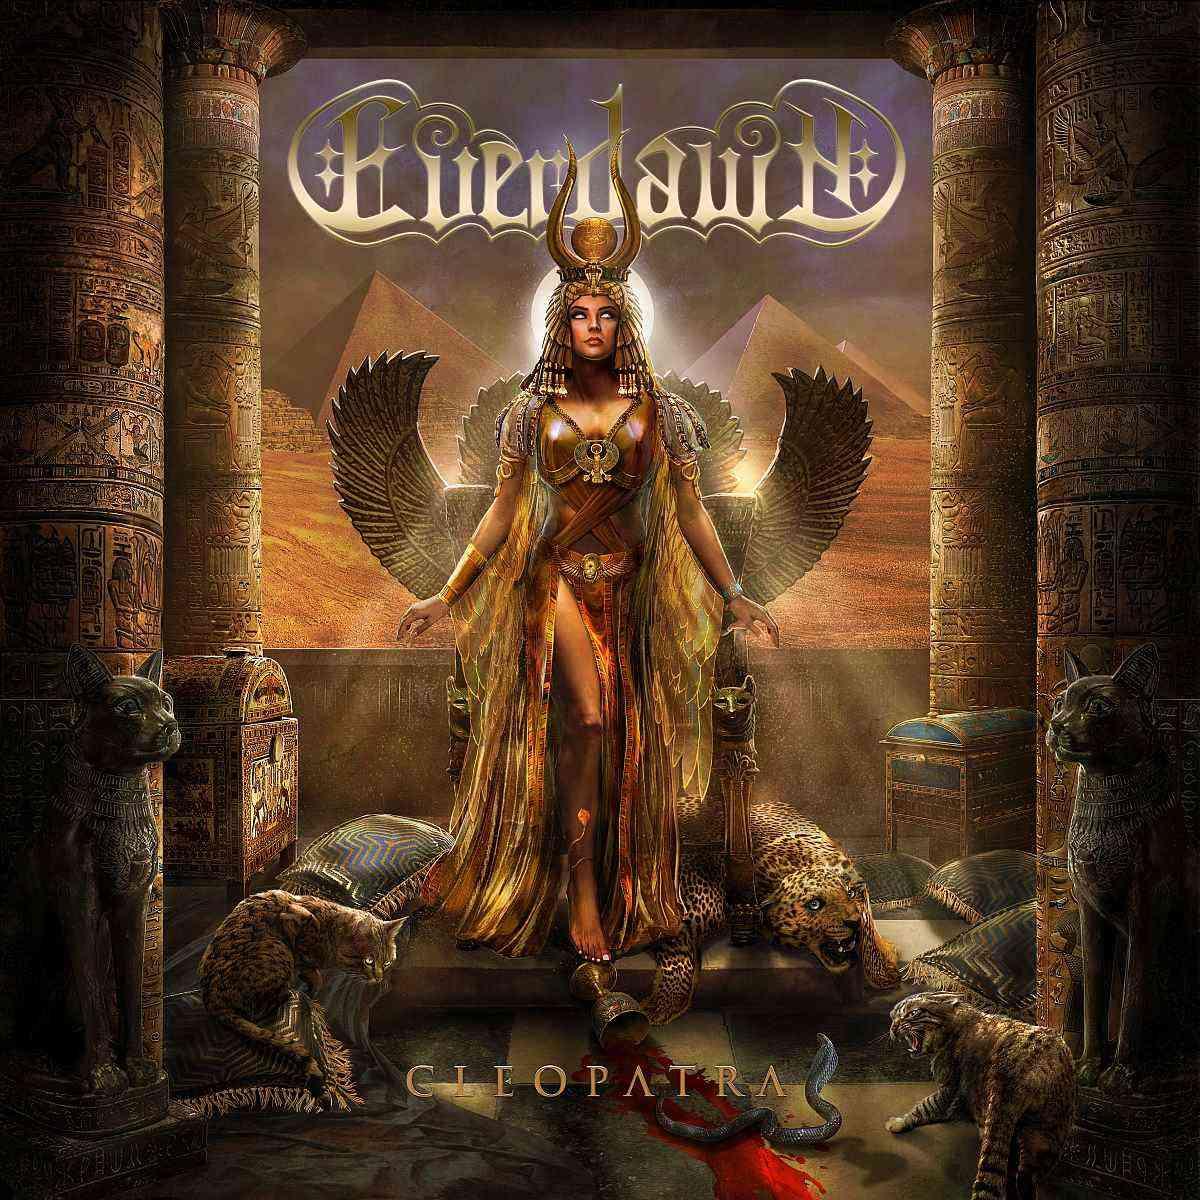 EVERDAWN - Cleopatra - album cover